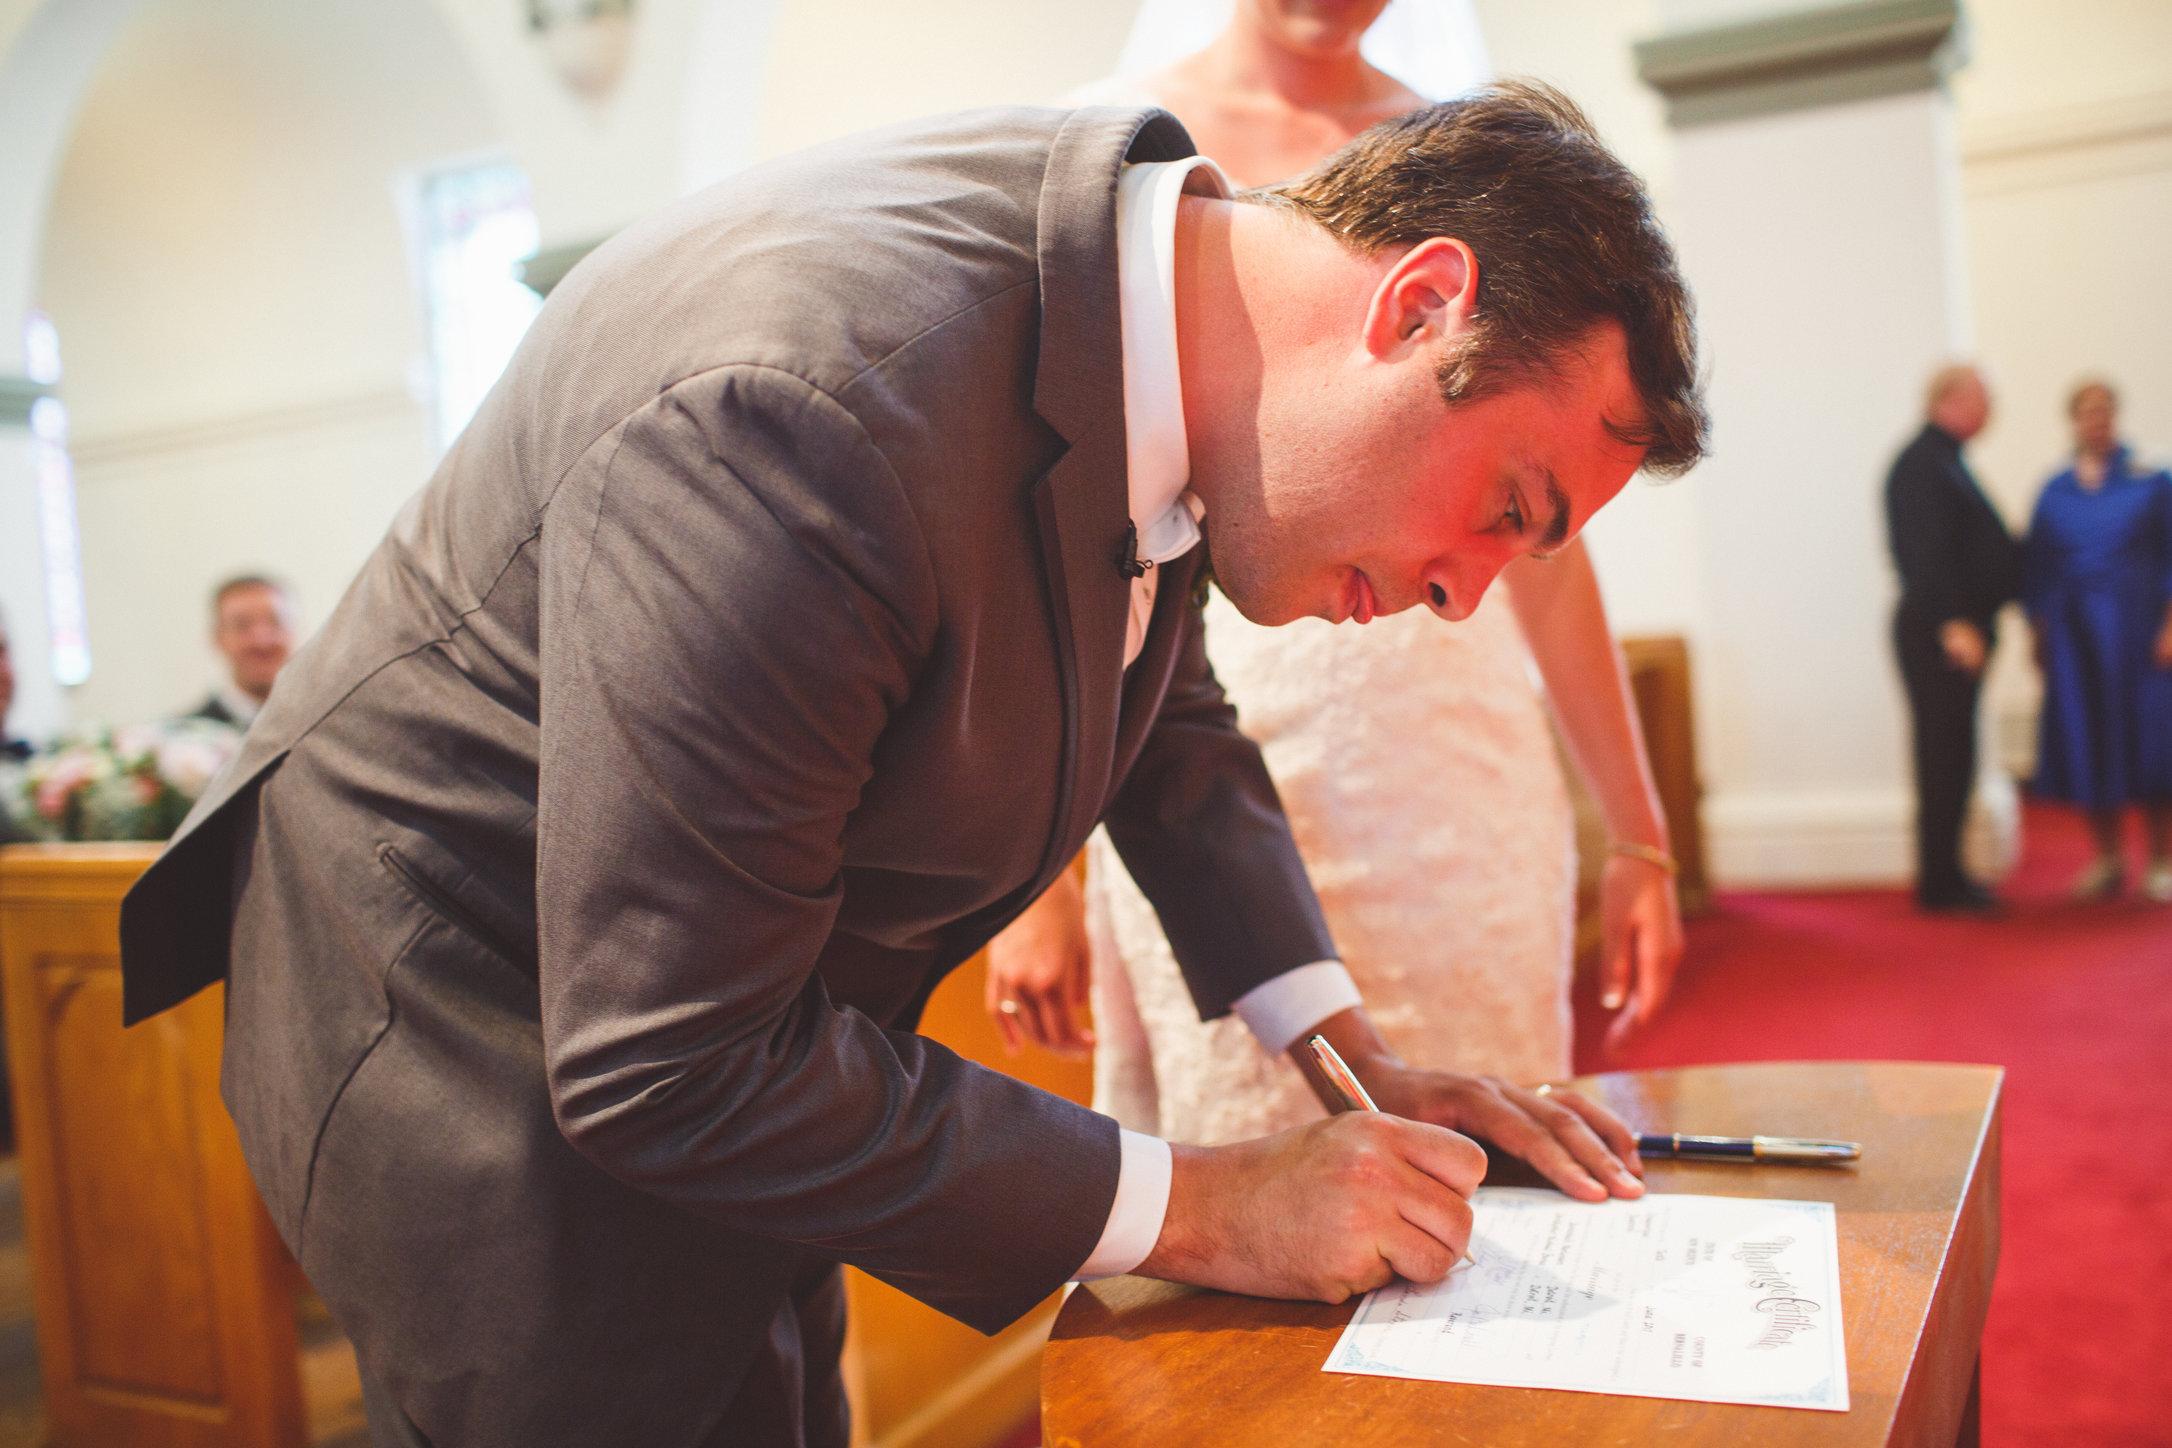 SandC-wedding-240.jpg